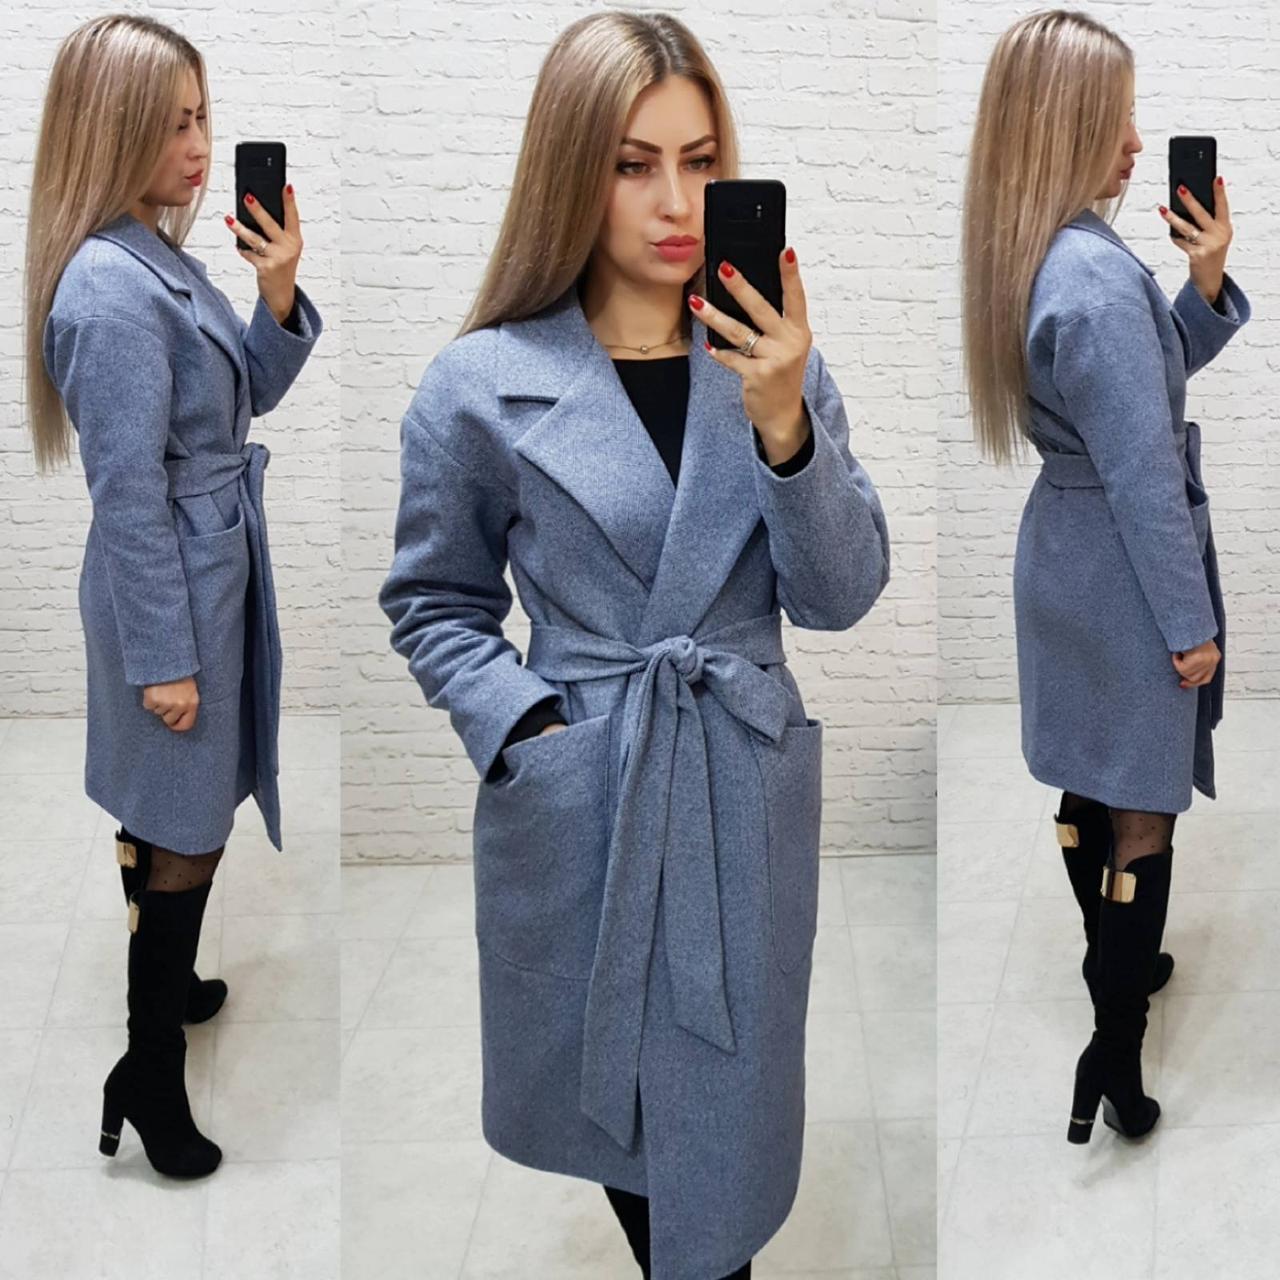 Кашемірове пальто утеплене на запах з кишенями,арт 175, колір сірий маренго (9)